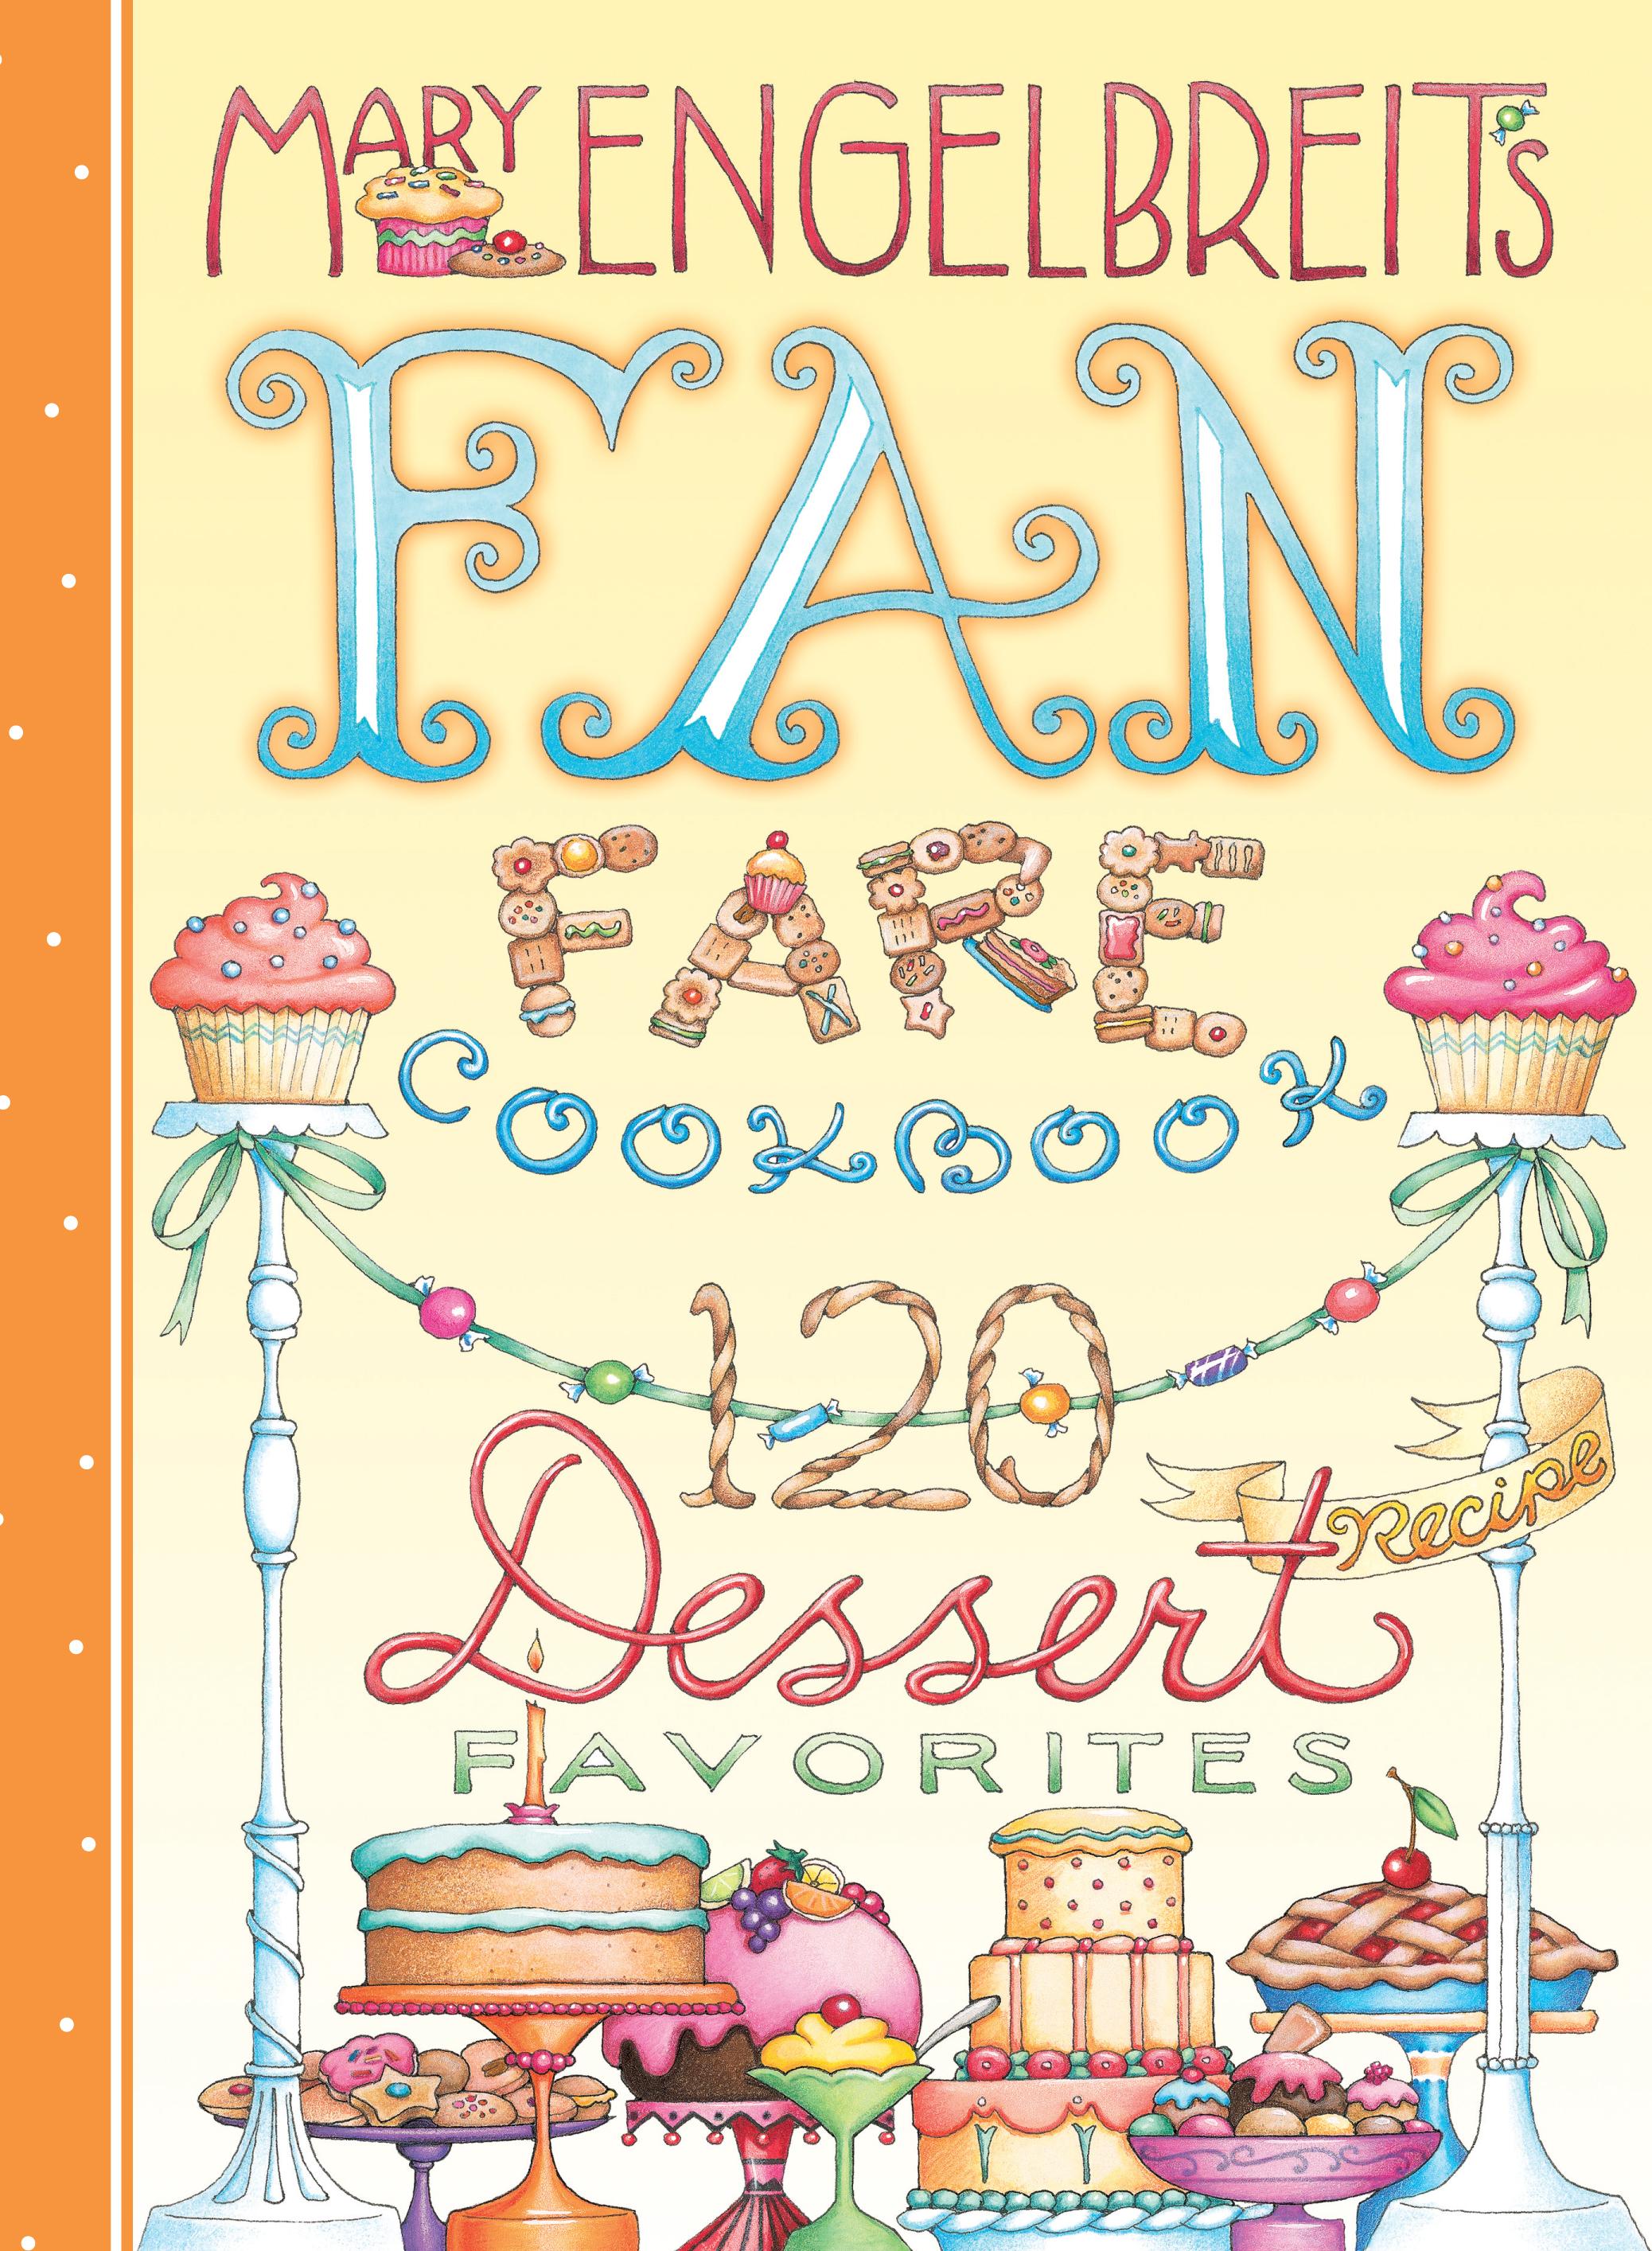 120 Dessert Recipe Favorites Mary Engelbreit's Fan Fare Cookbook